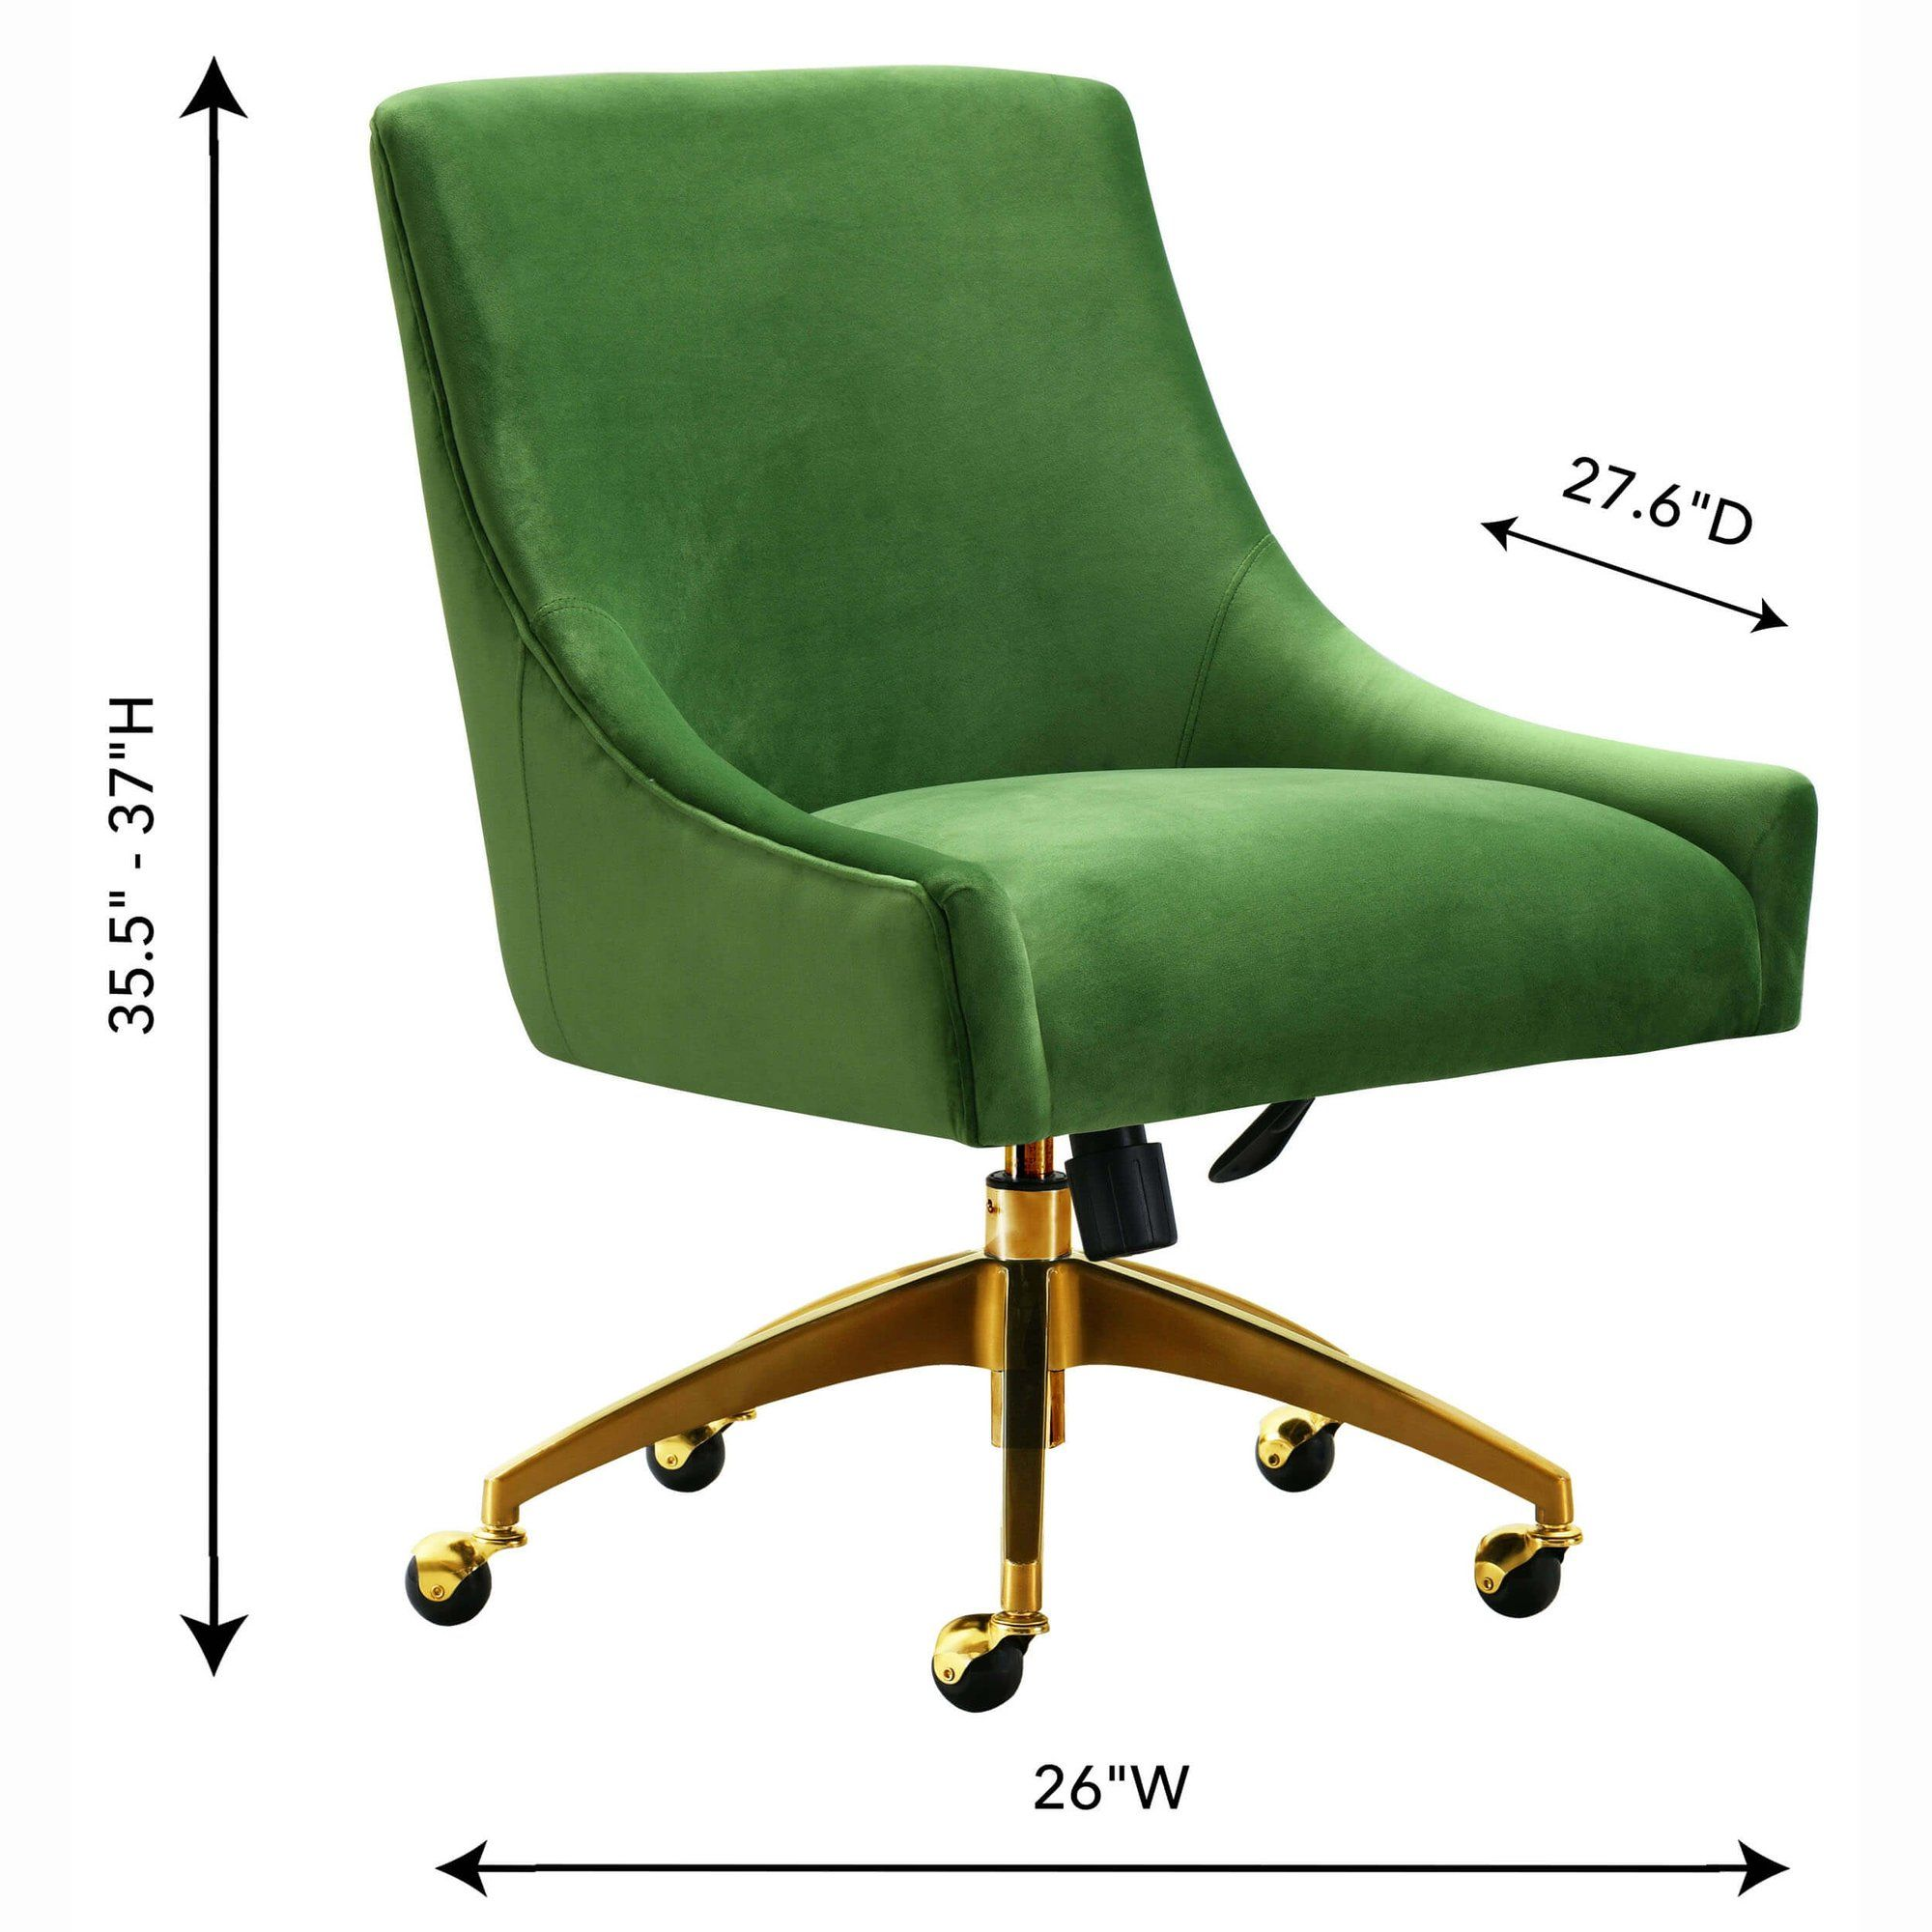 Beatrix swivel office chair green in 2020 office chair